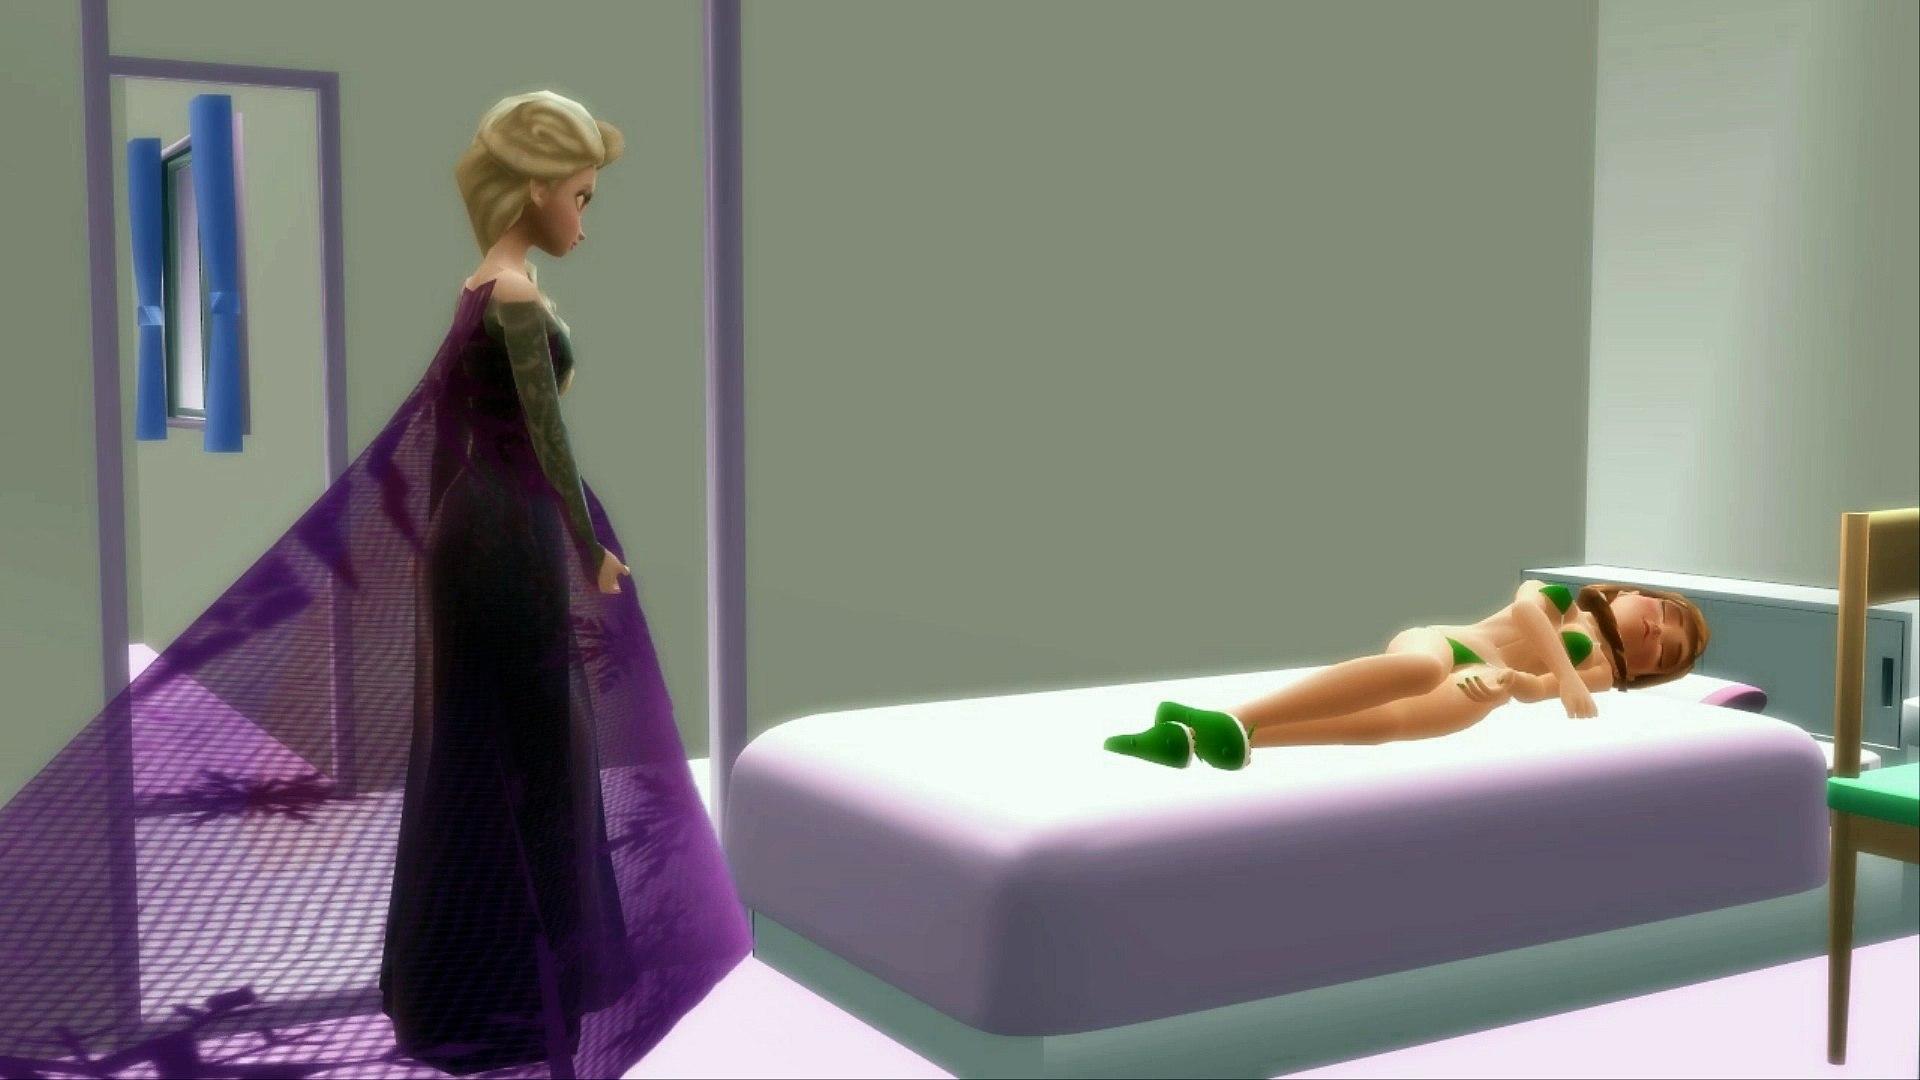 Vampire Frozen Elsa Attempts to Bite Sleeping Anna in Bikini Frozen 2 3D Animation Parody CheekSpear